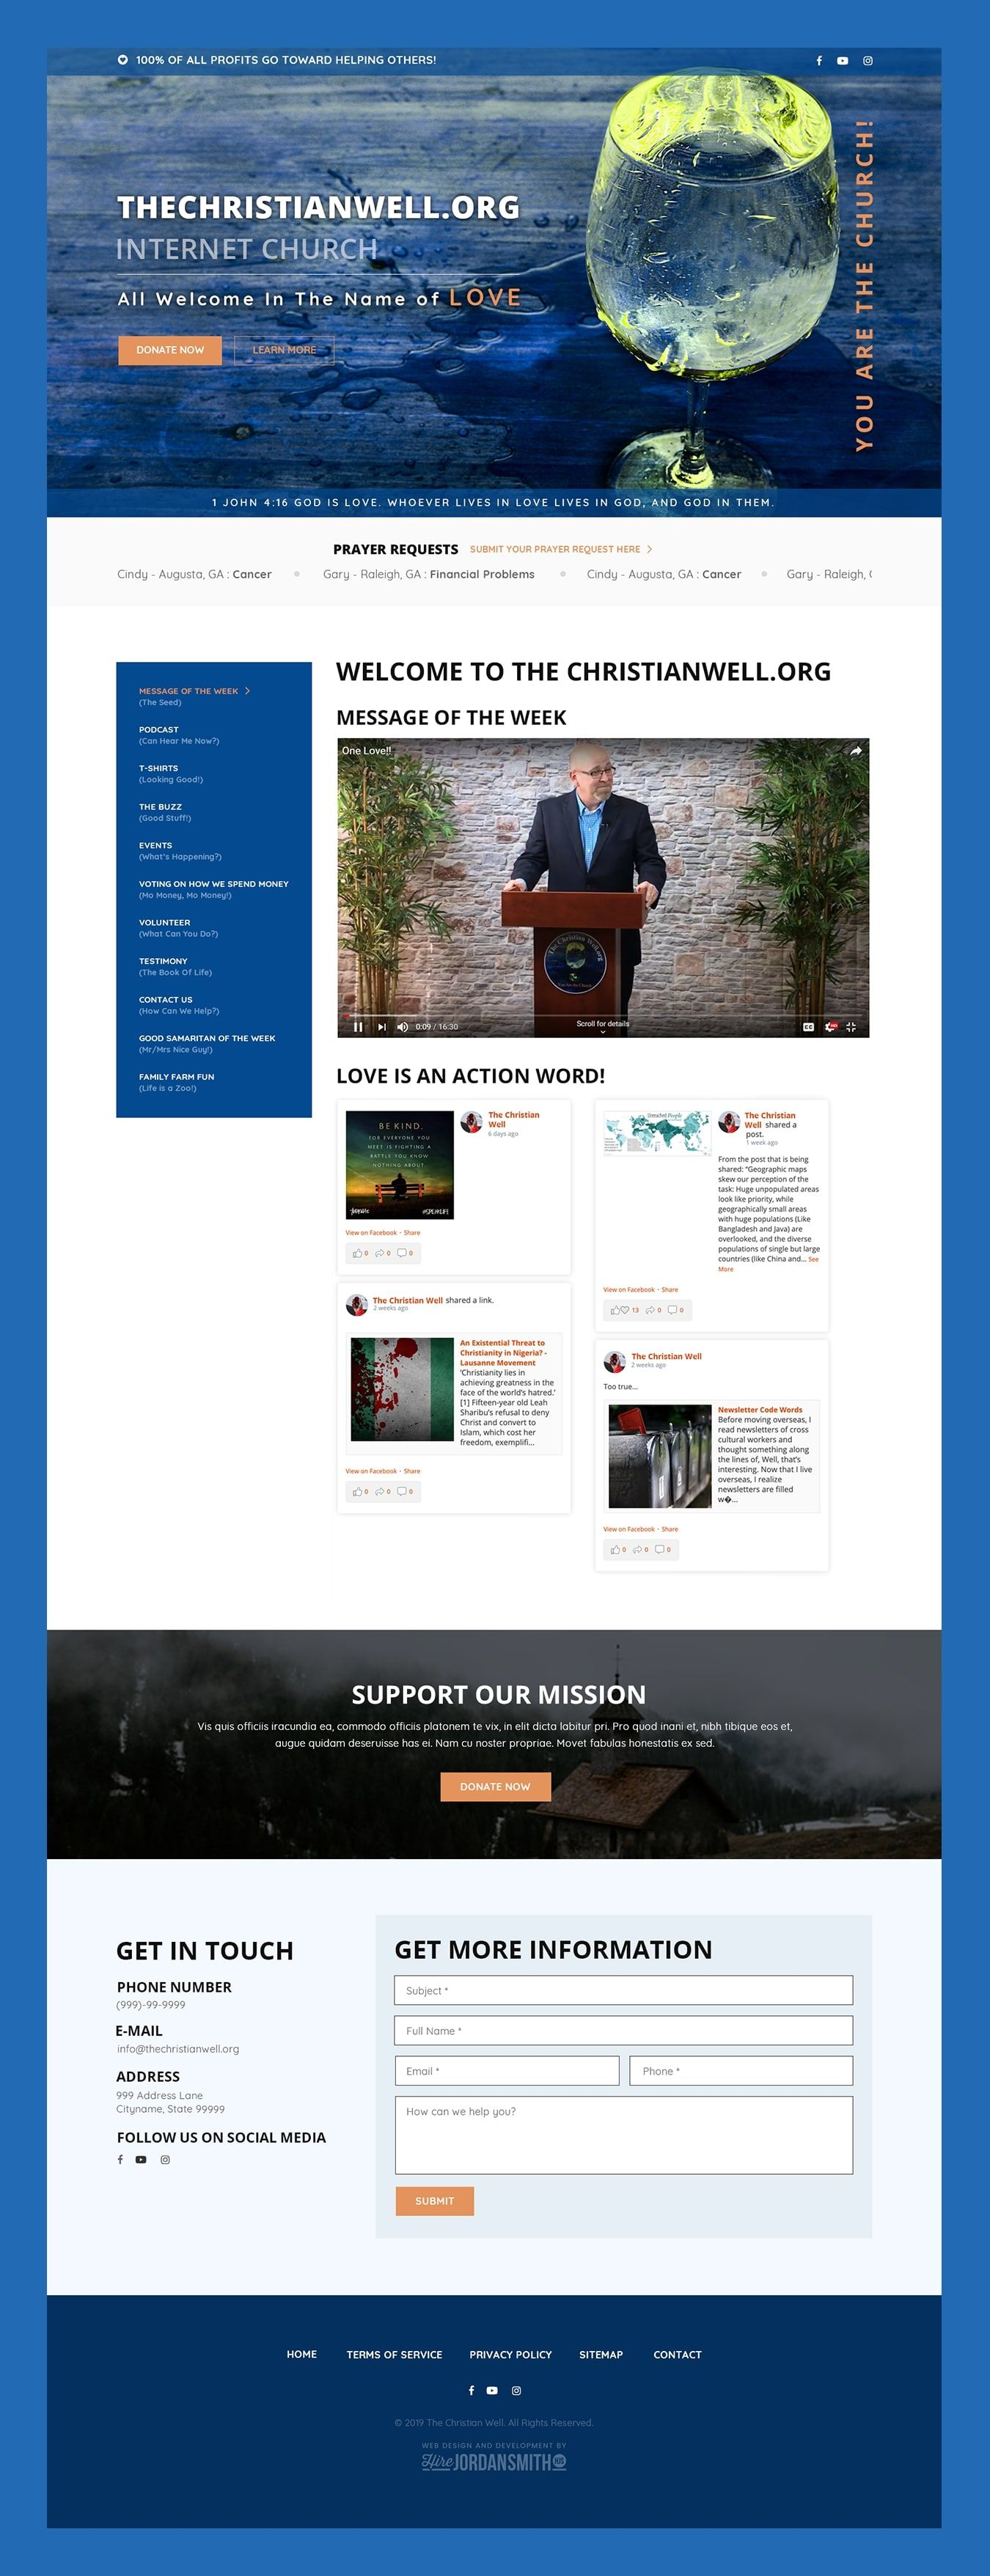 The Christian Well Web Design By Hire Jordan Smith Web Design Web Design Projects Web Development Design